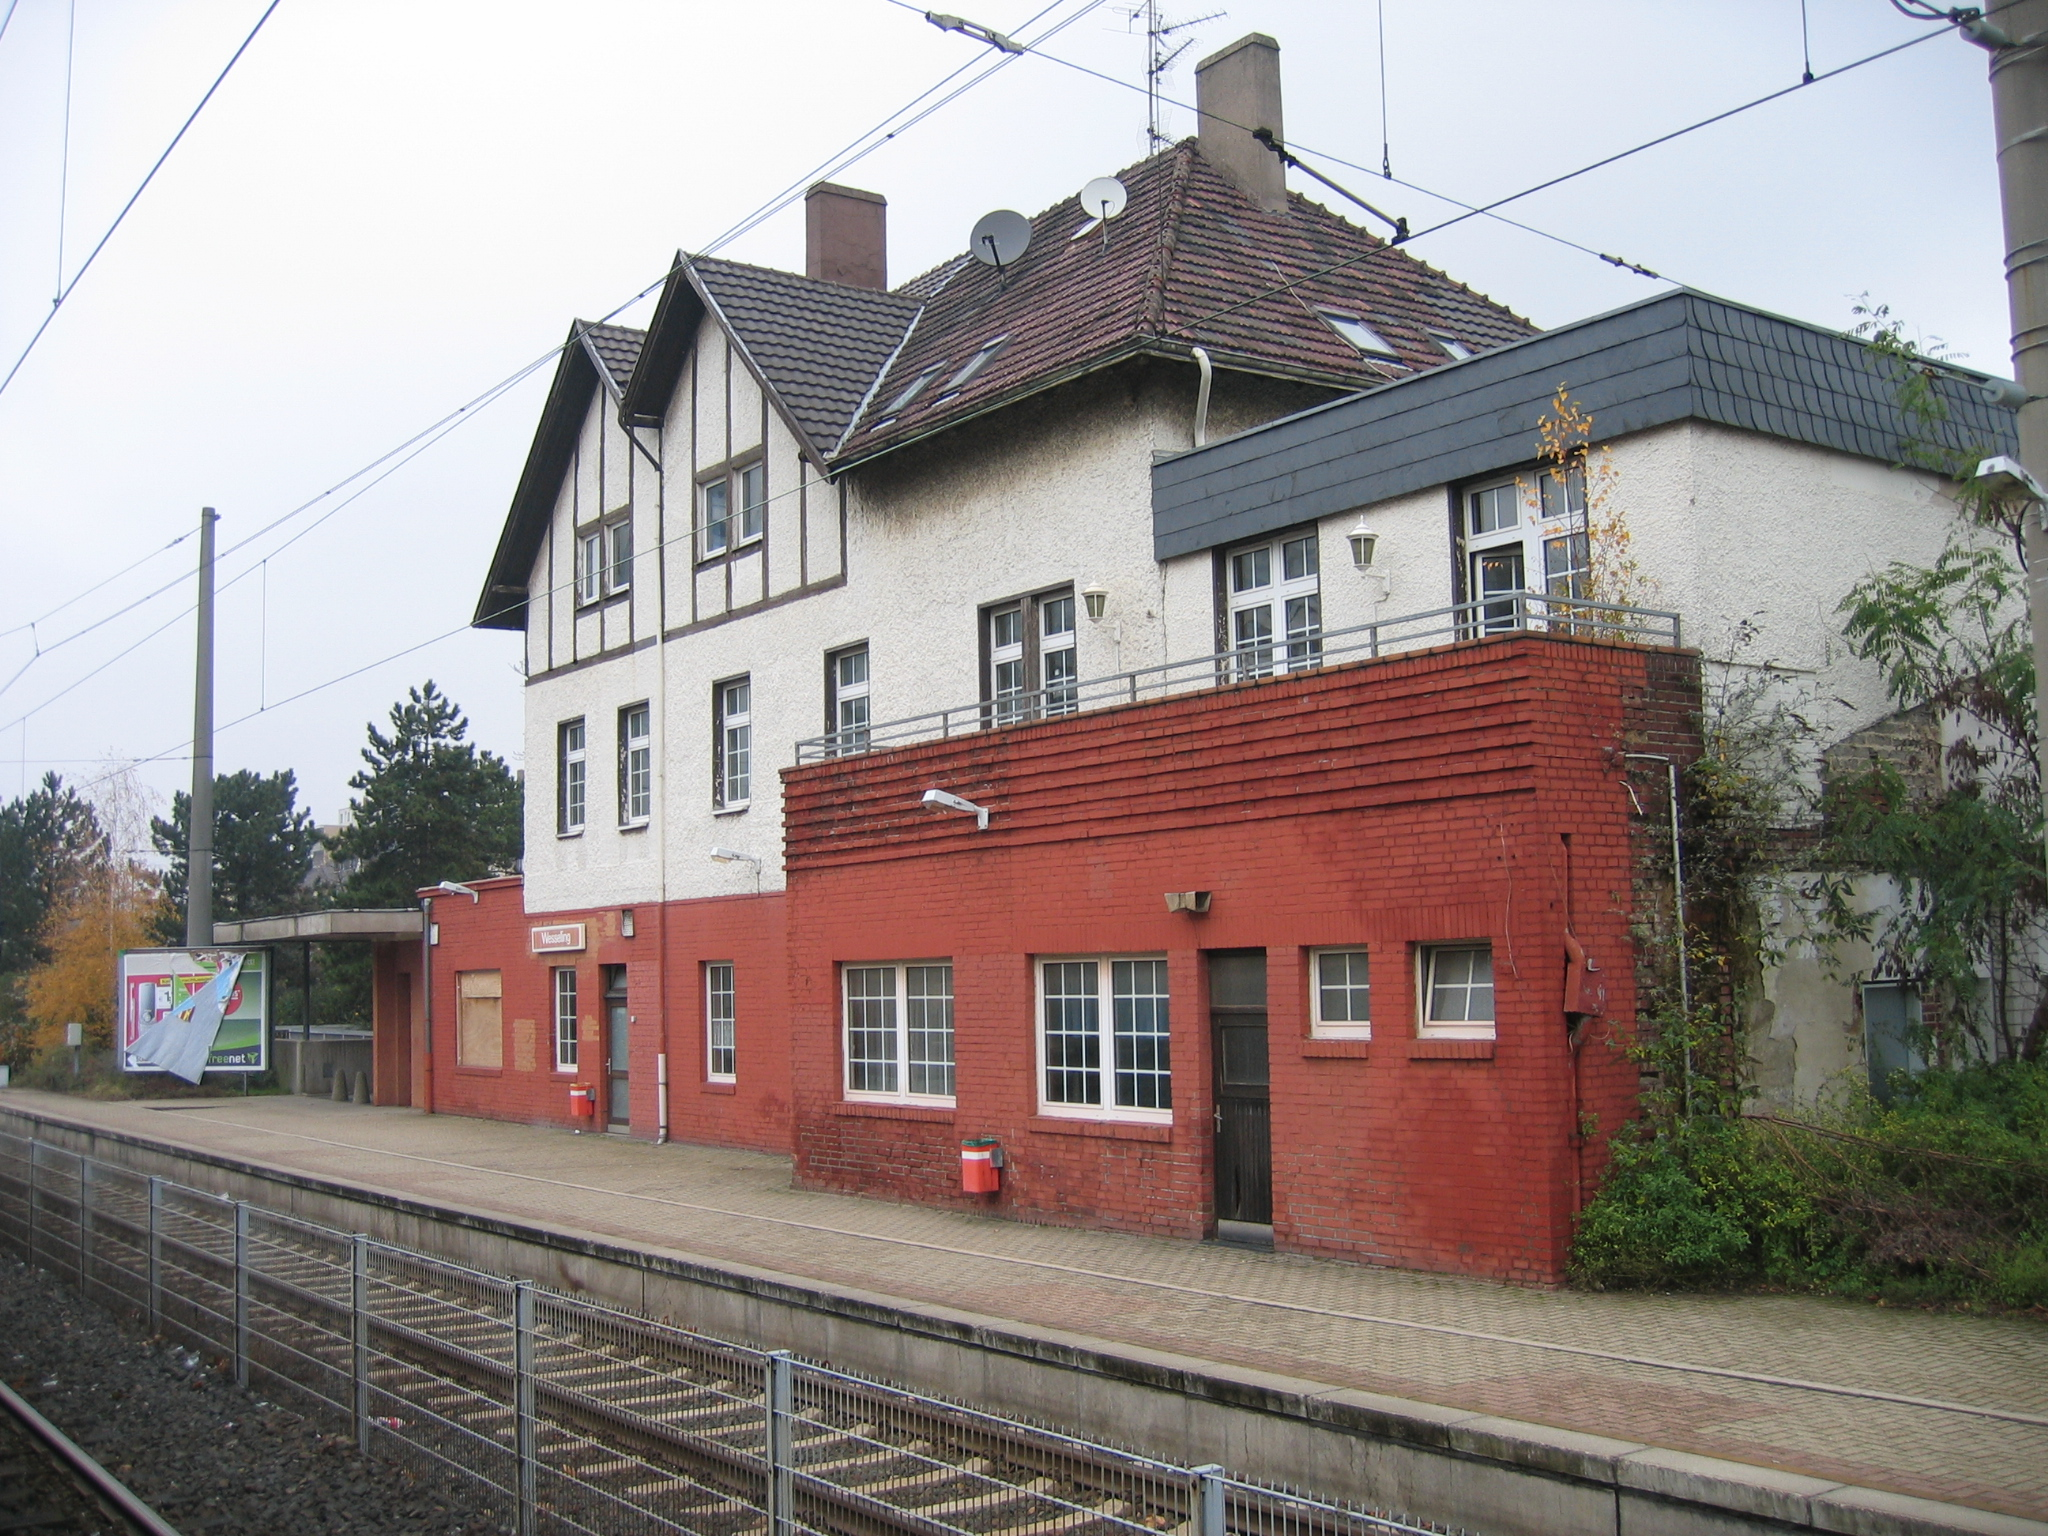 Stadtbahn koeln wesseling - The Köln - Bonner Eisenbahn